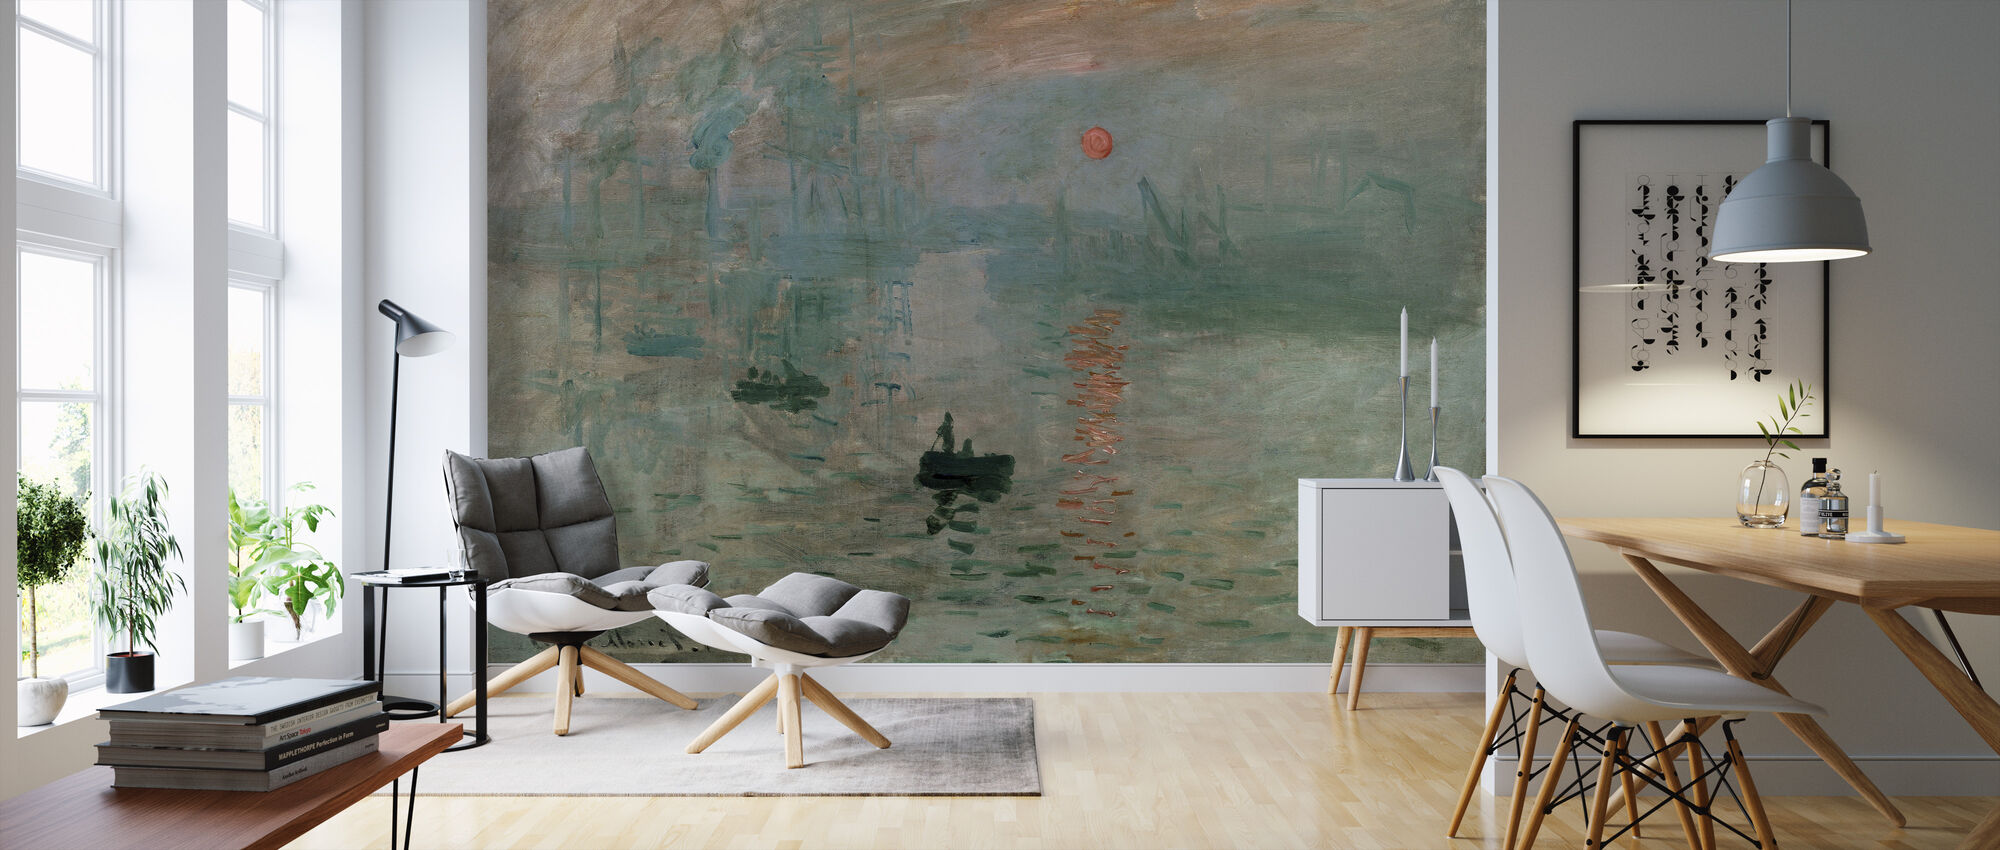 Monet, Claud - Impression - Tapetti - Olohuone